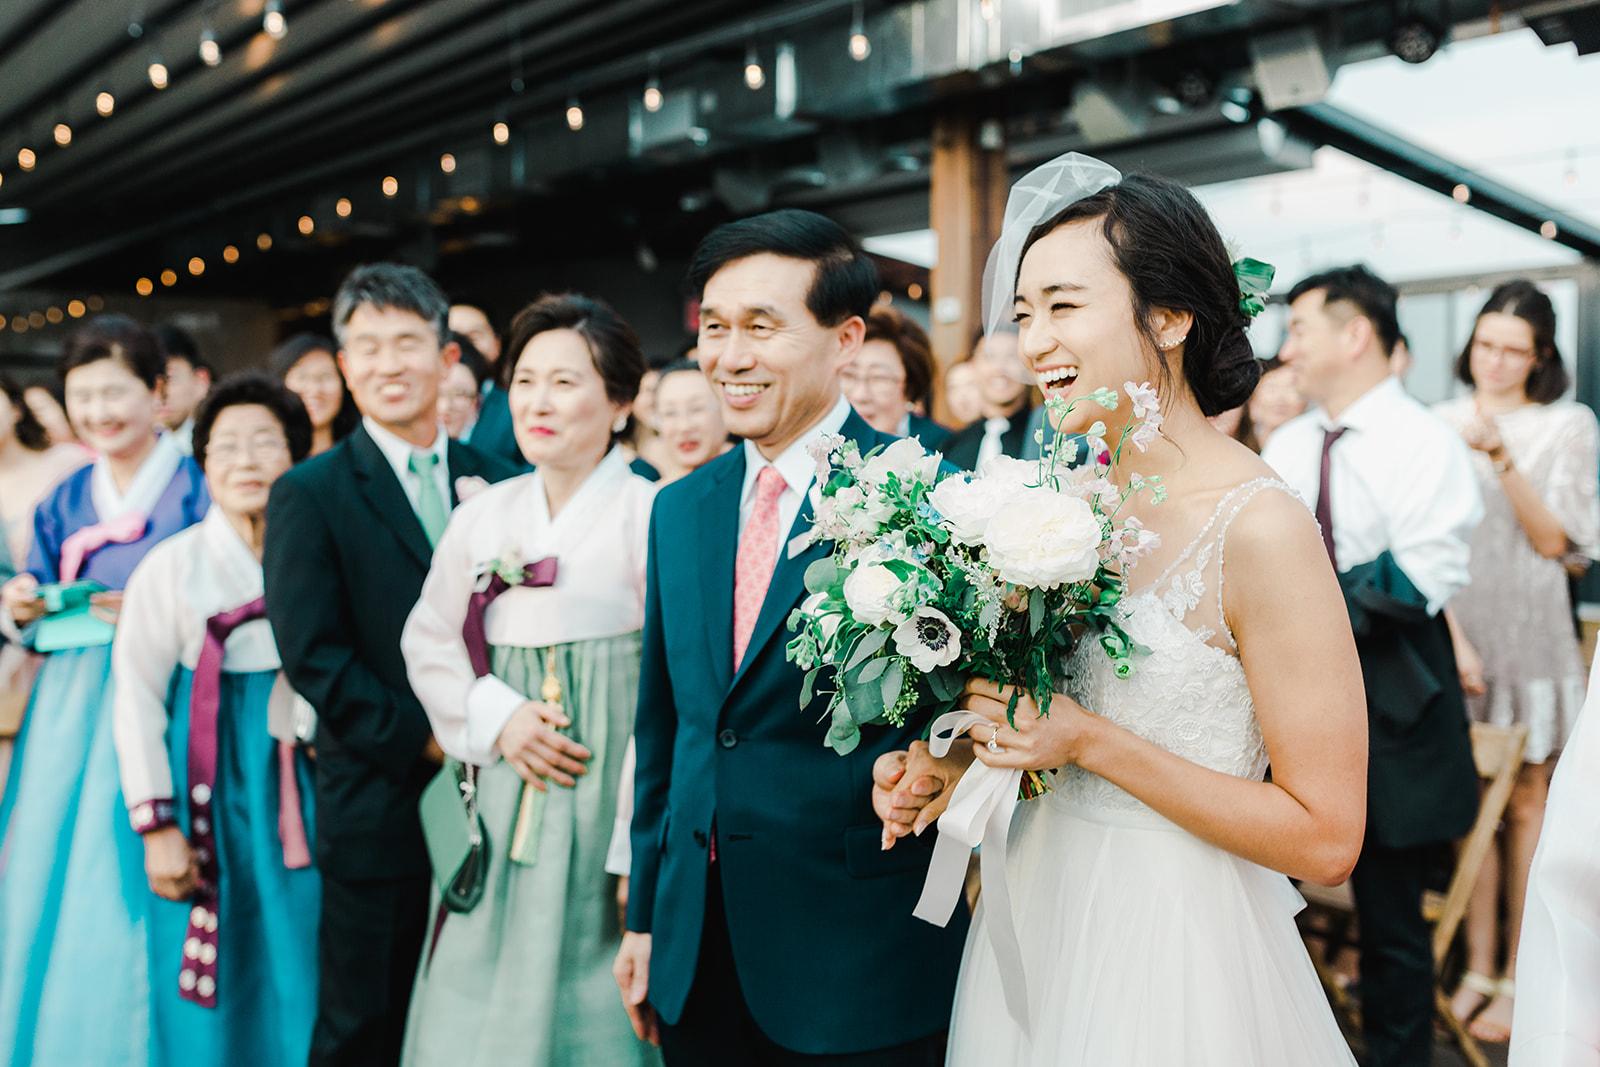 JWHJ-married-268.jpg